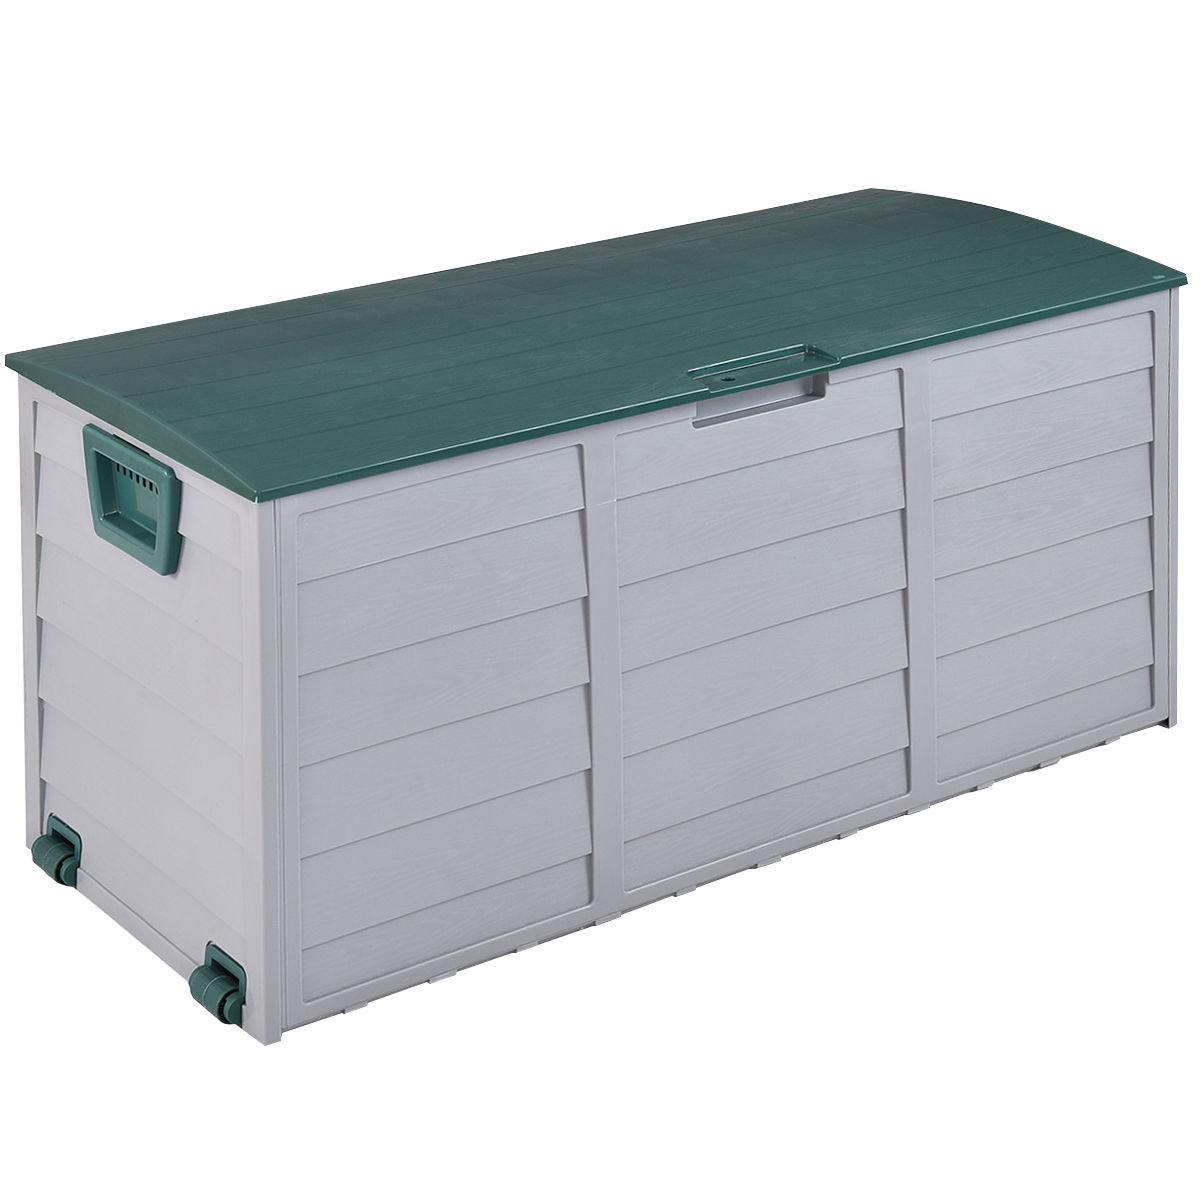 "GHP 44""x20""x22"" Gray & Green 7-Gallon Capacity Patio Garage Deck Storage Bench"